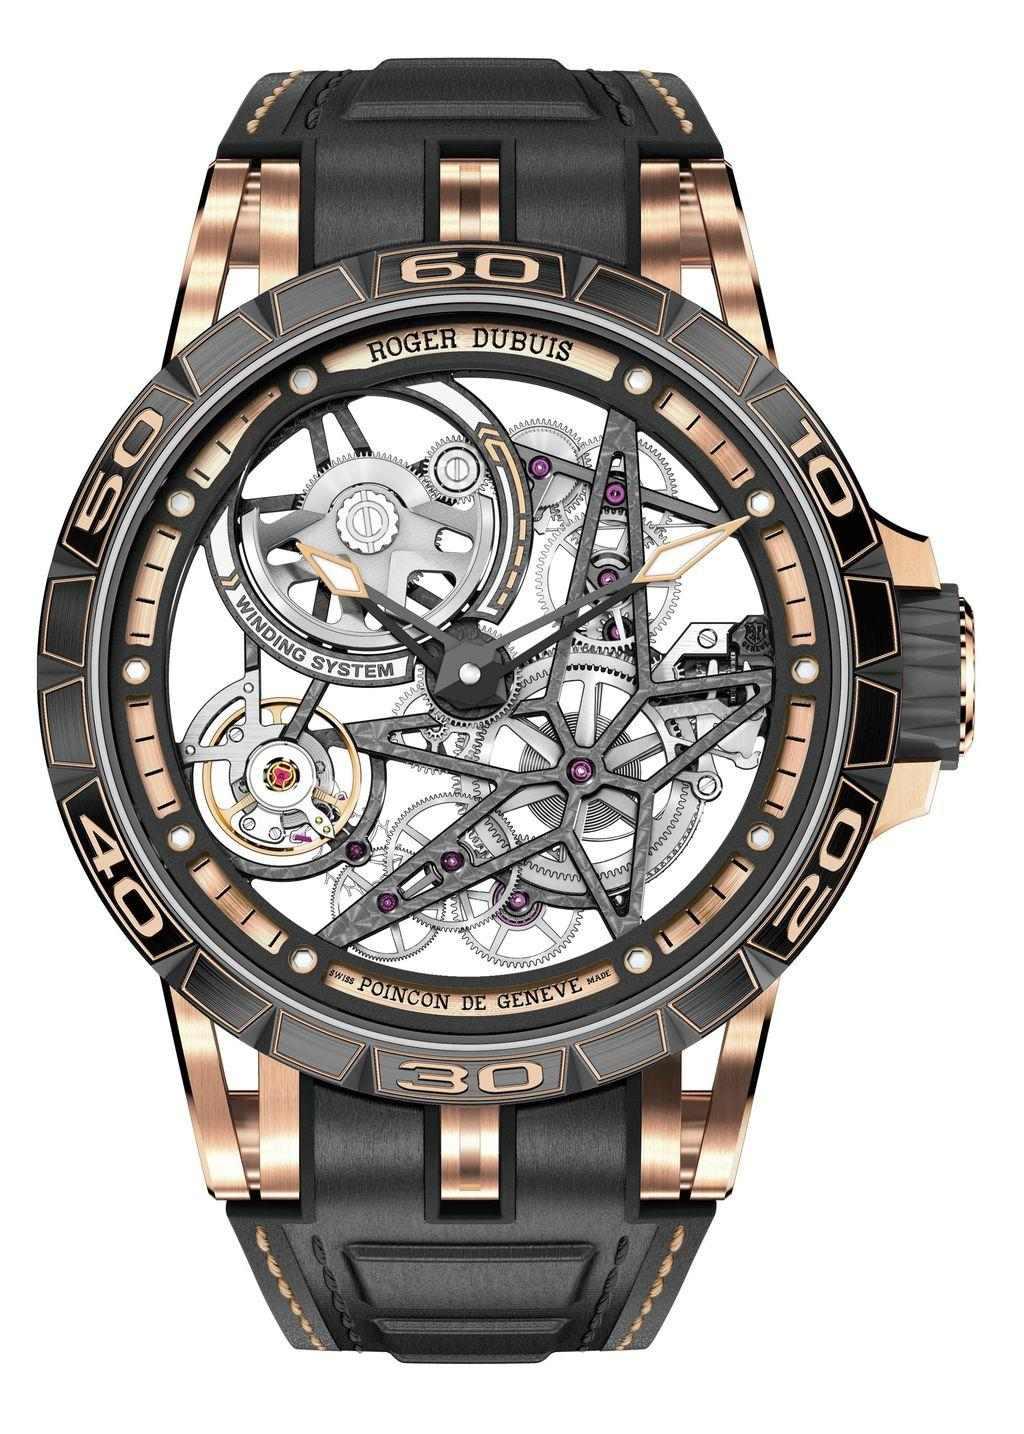 Roger Dubuis Excalibur Spider 鏤空自動上鍊腕錶